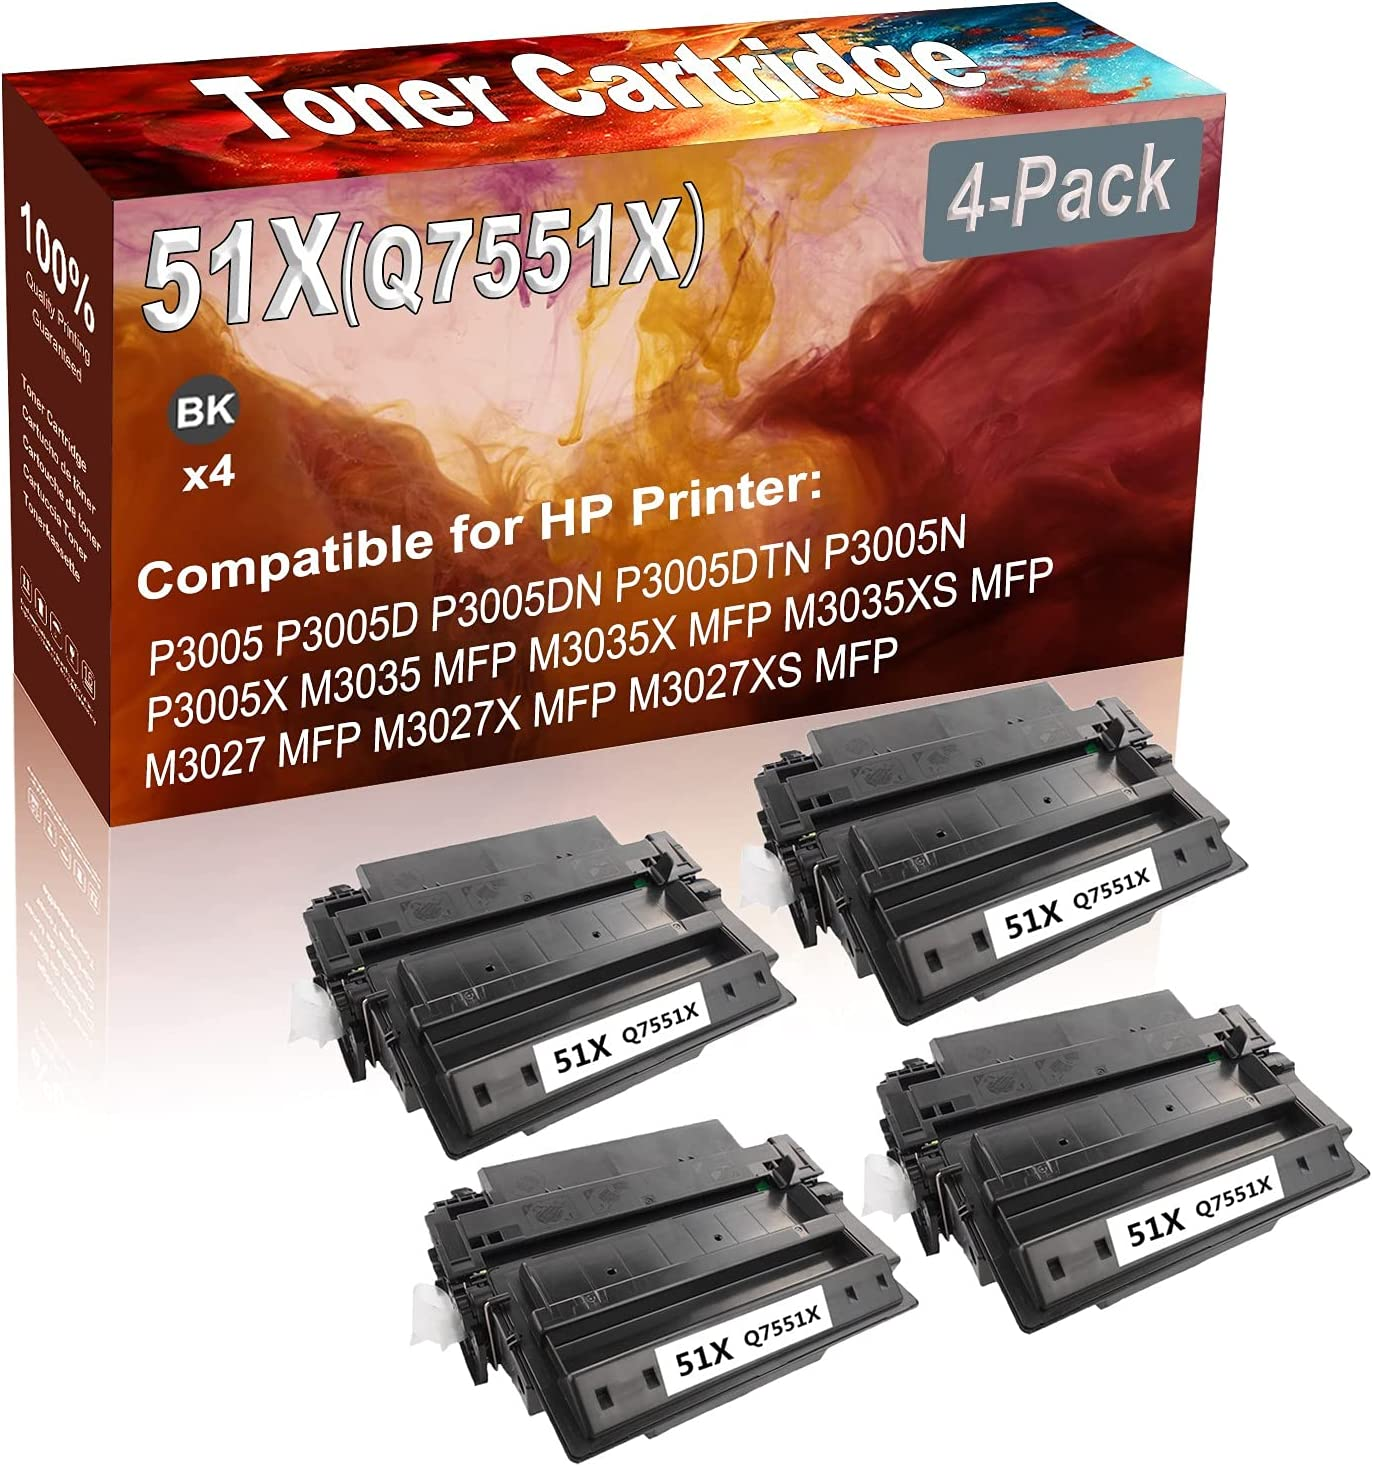 4-Pack (Black) Compatible 51X (Q7551X) Printer Toner Cartridge (High Capacity) fit for HP P3005 P3005D P3005DN Printer